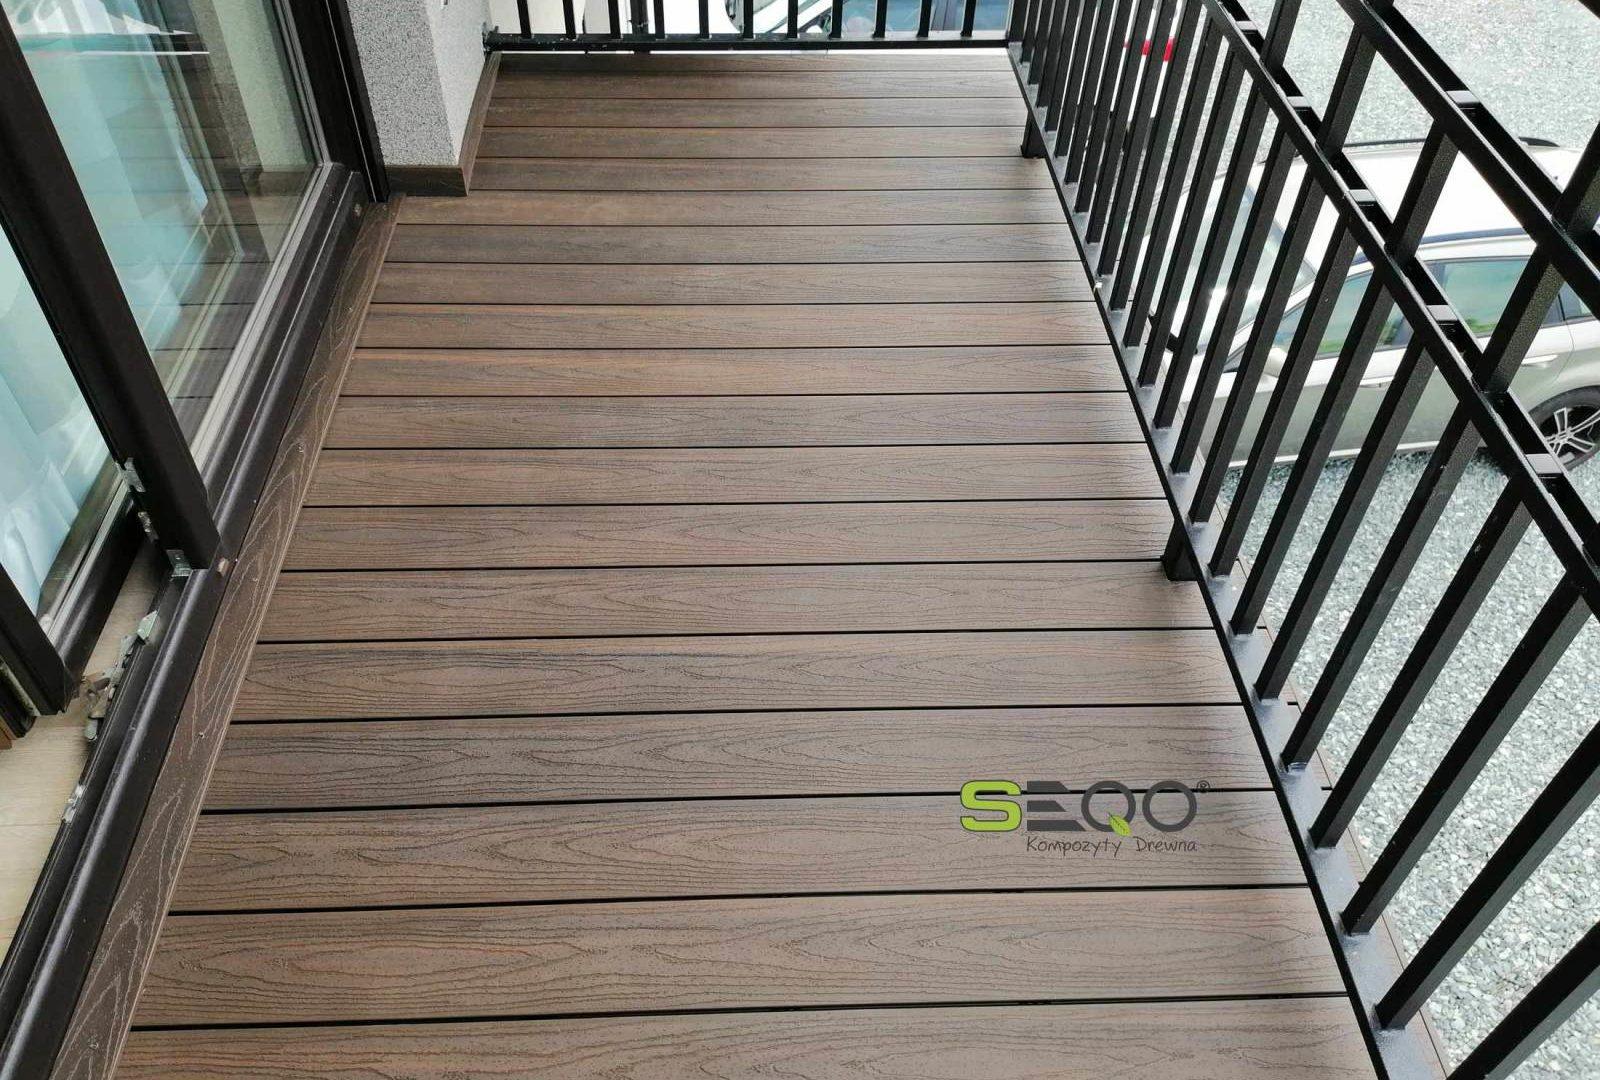 Balkon deska kompozytowa SEQO Premium